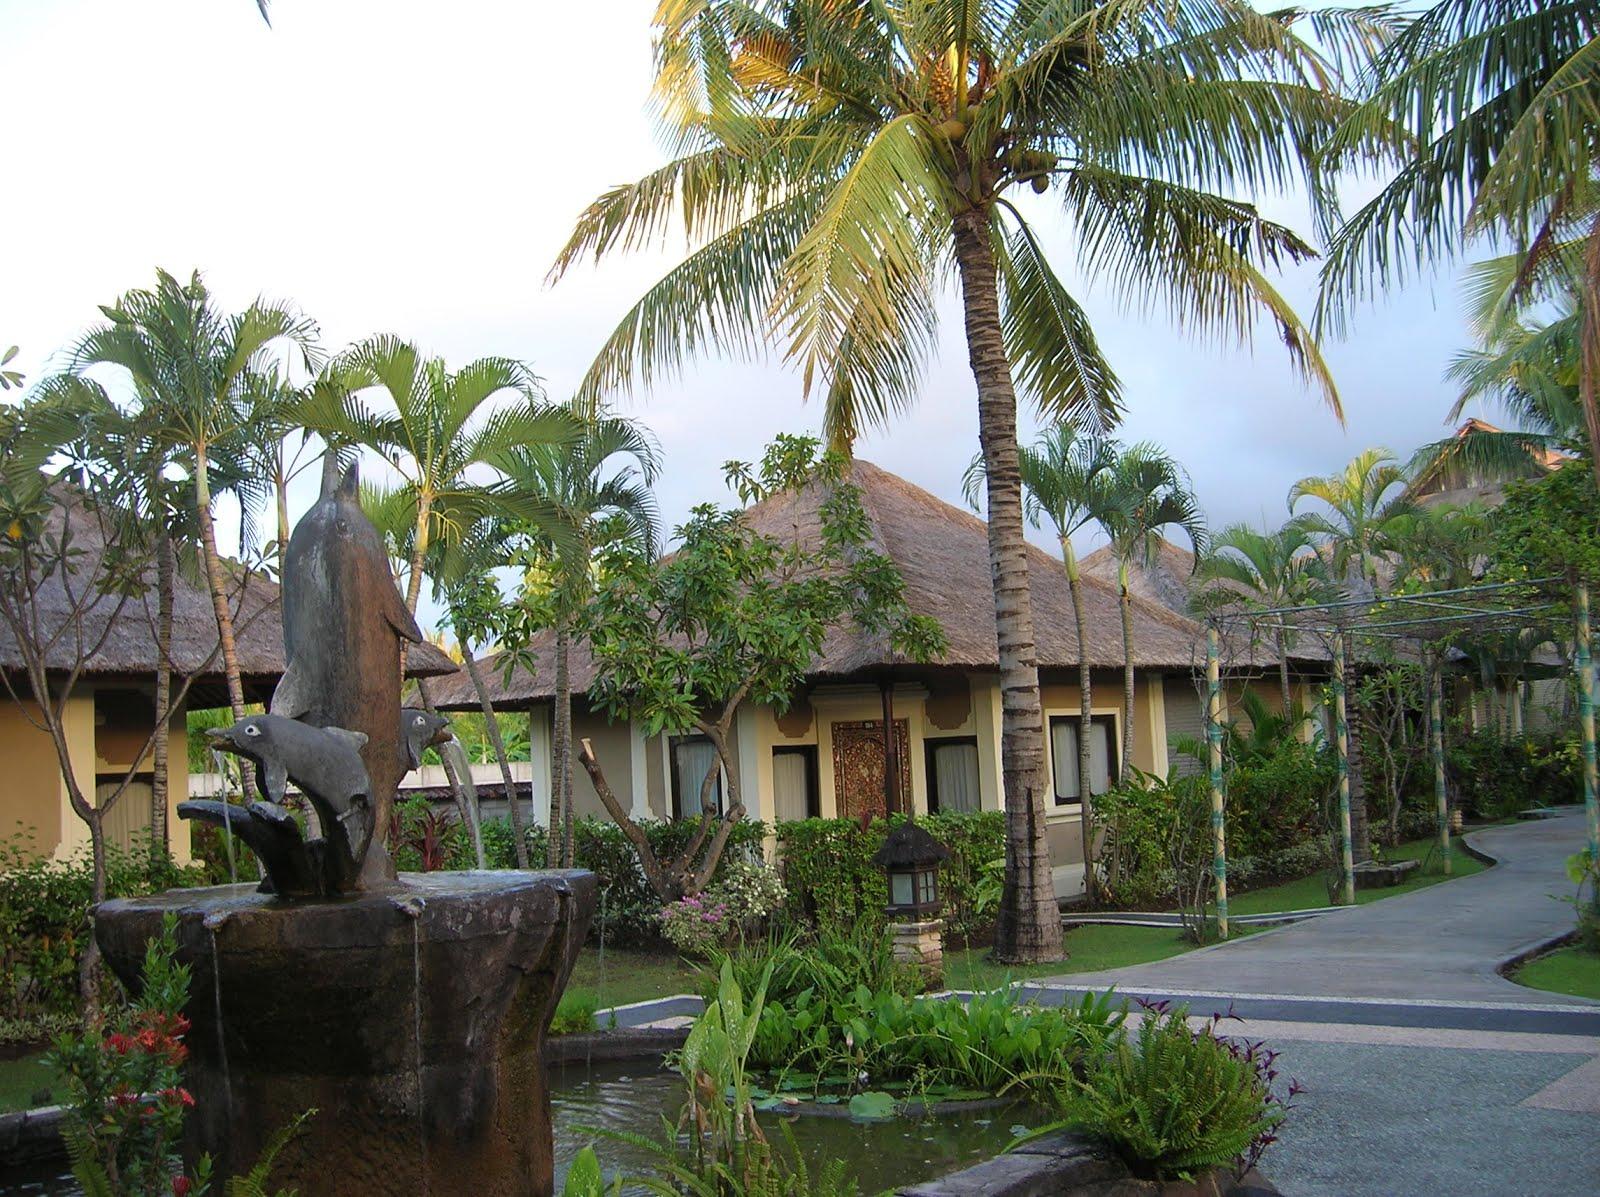 Hotel Aneka Lovina, Isla de Bali,Indonesia, vuelta al mundo, round the world, La vuelta al mundo de Asun y Ricardo